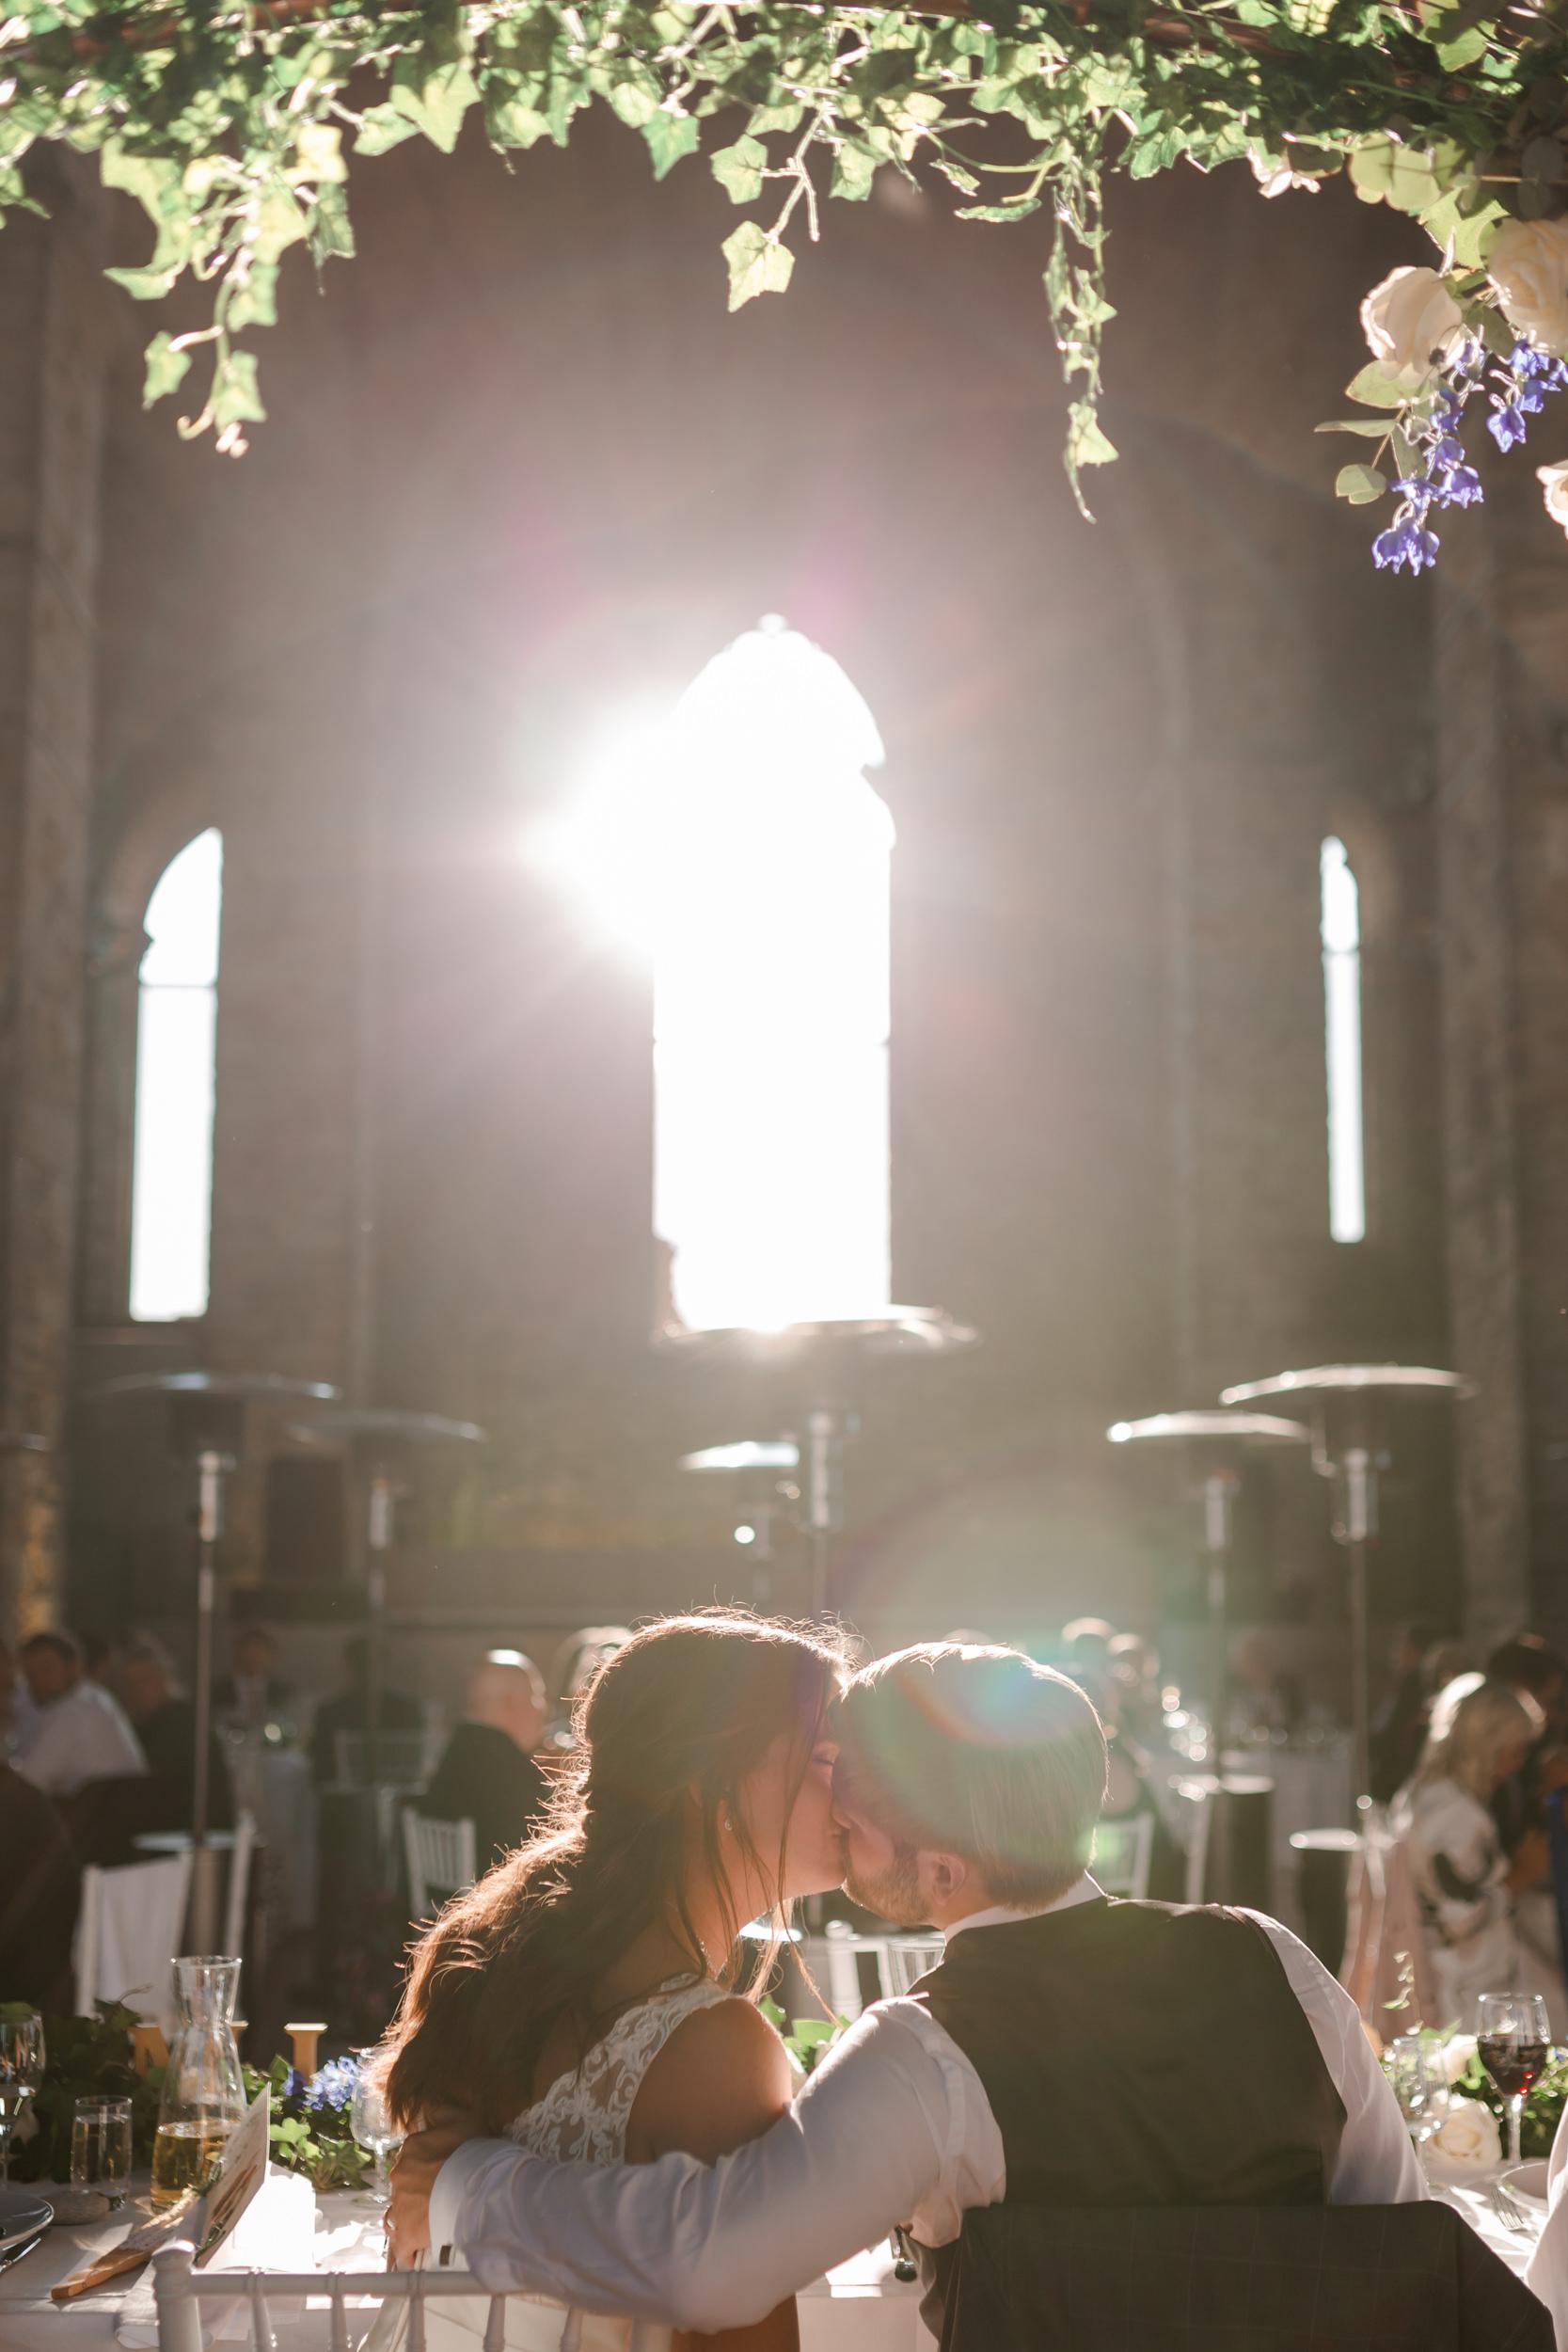 Bröllop i Visby i St Nicolai ruin